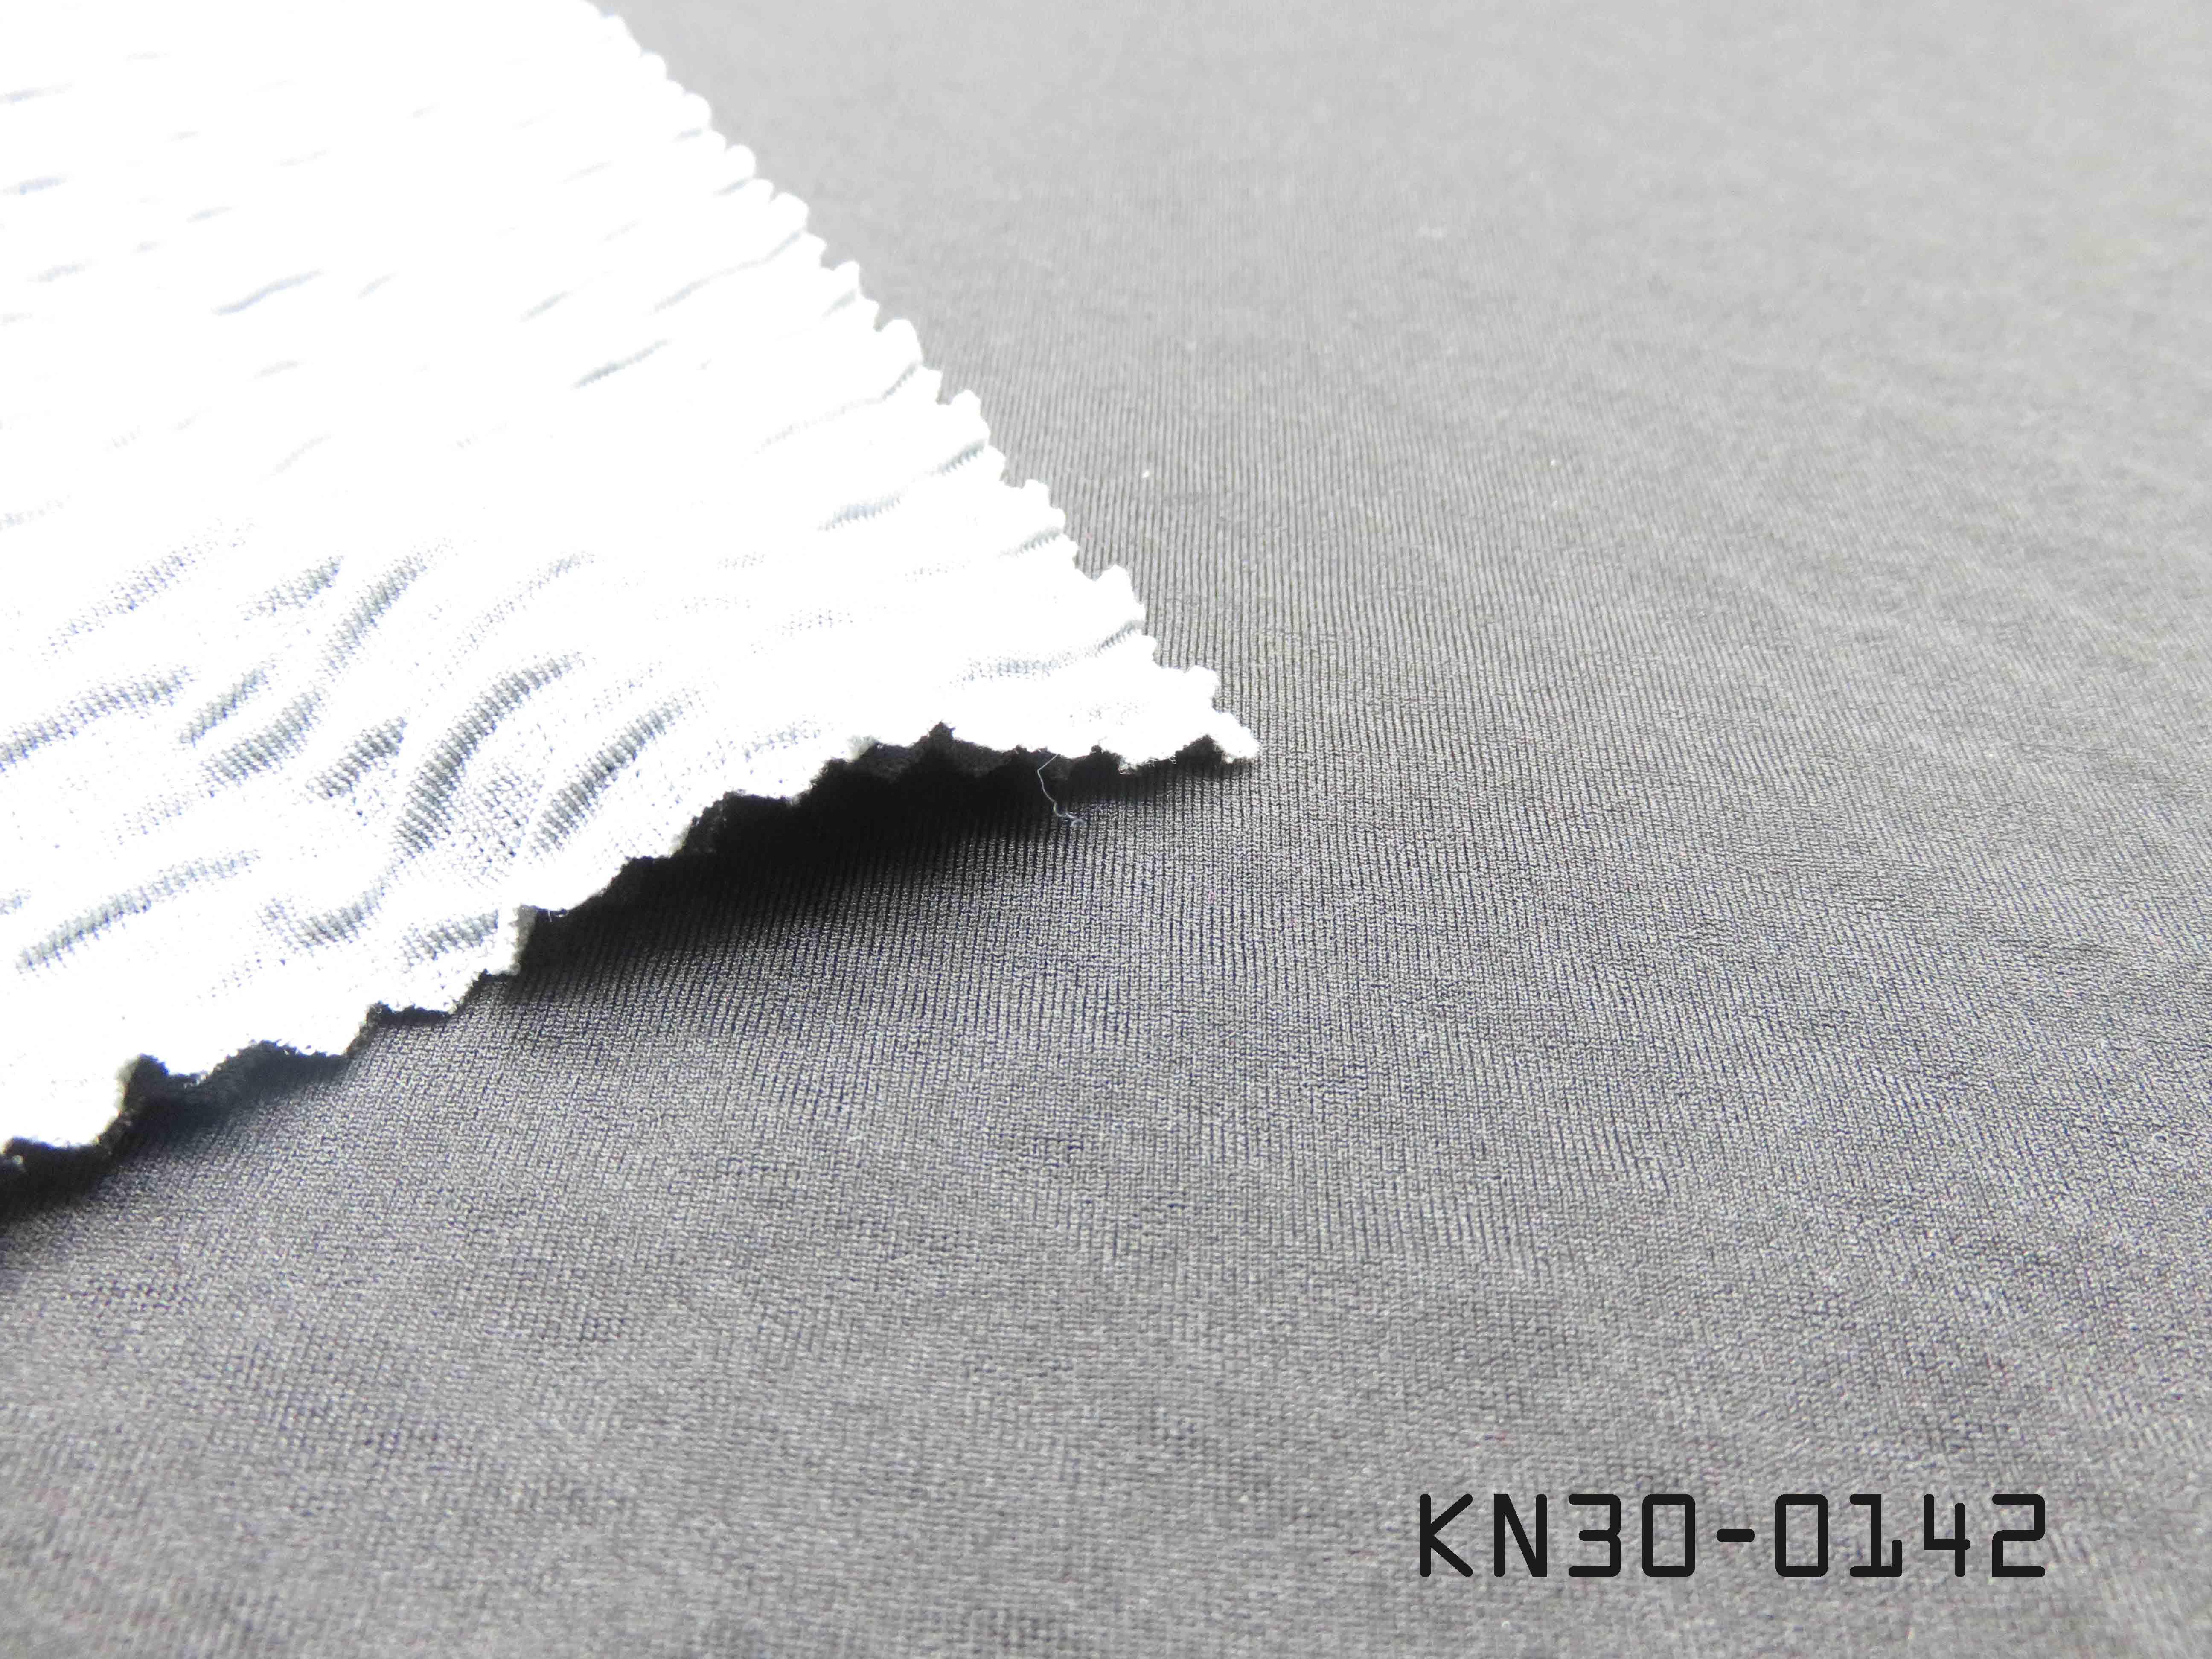 KN30-0142